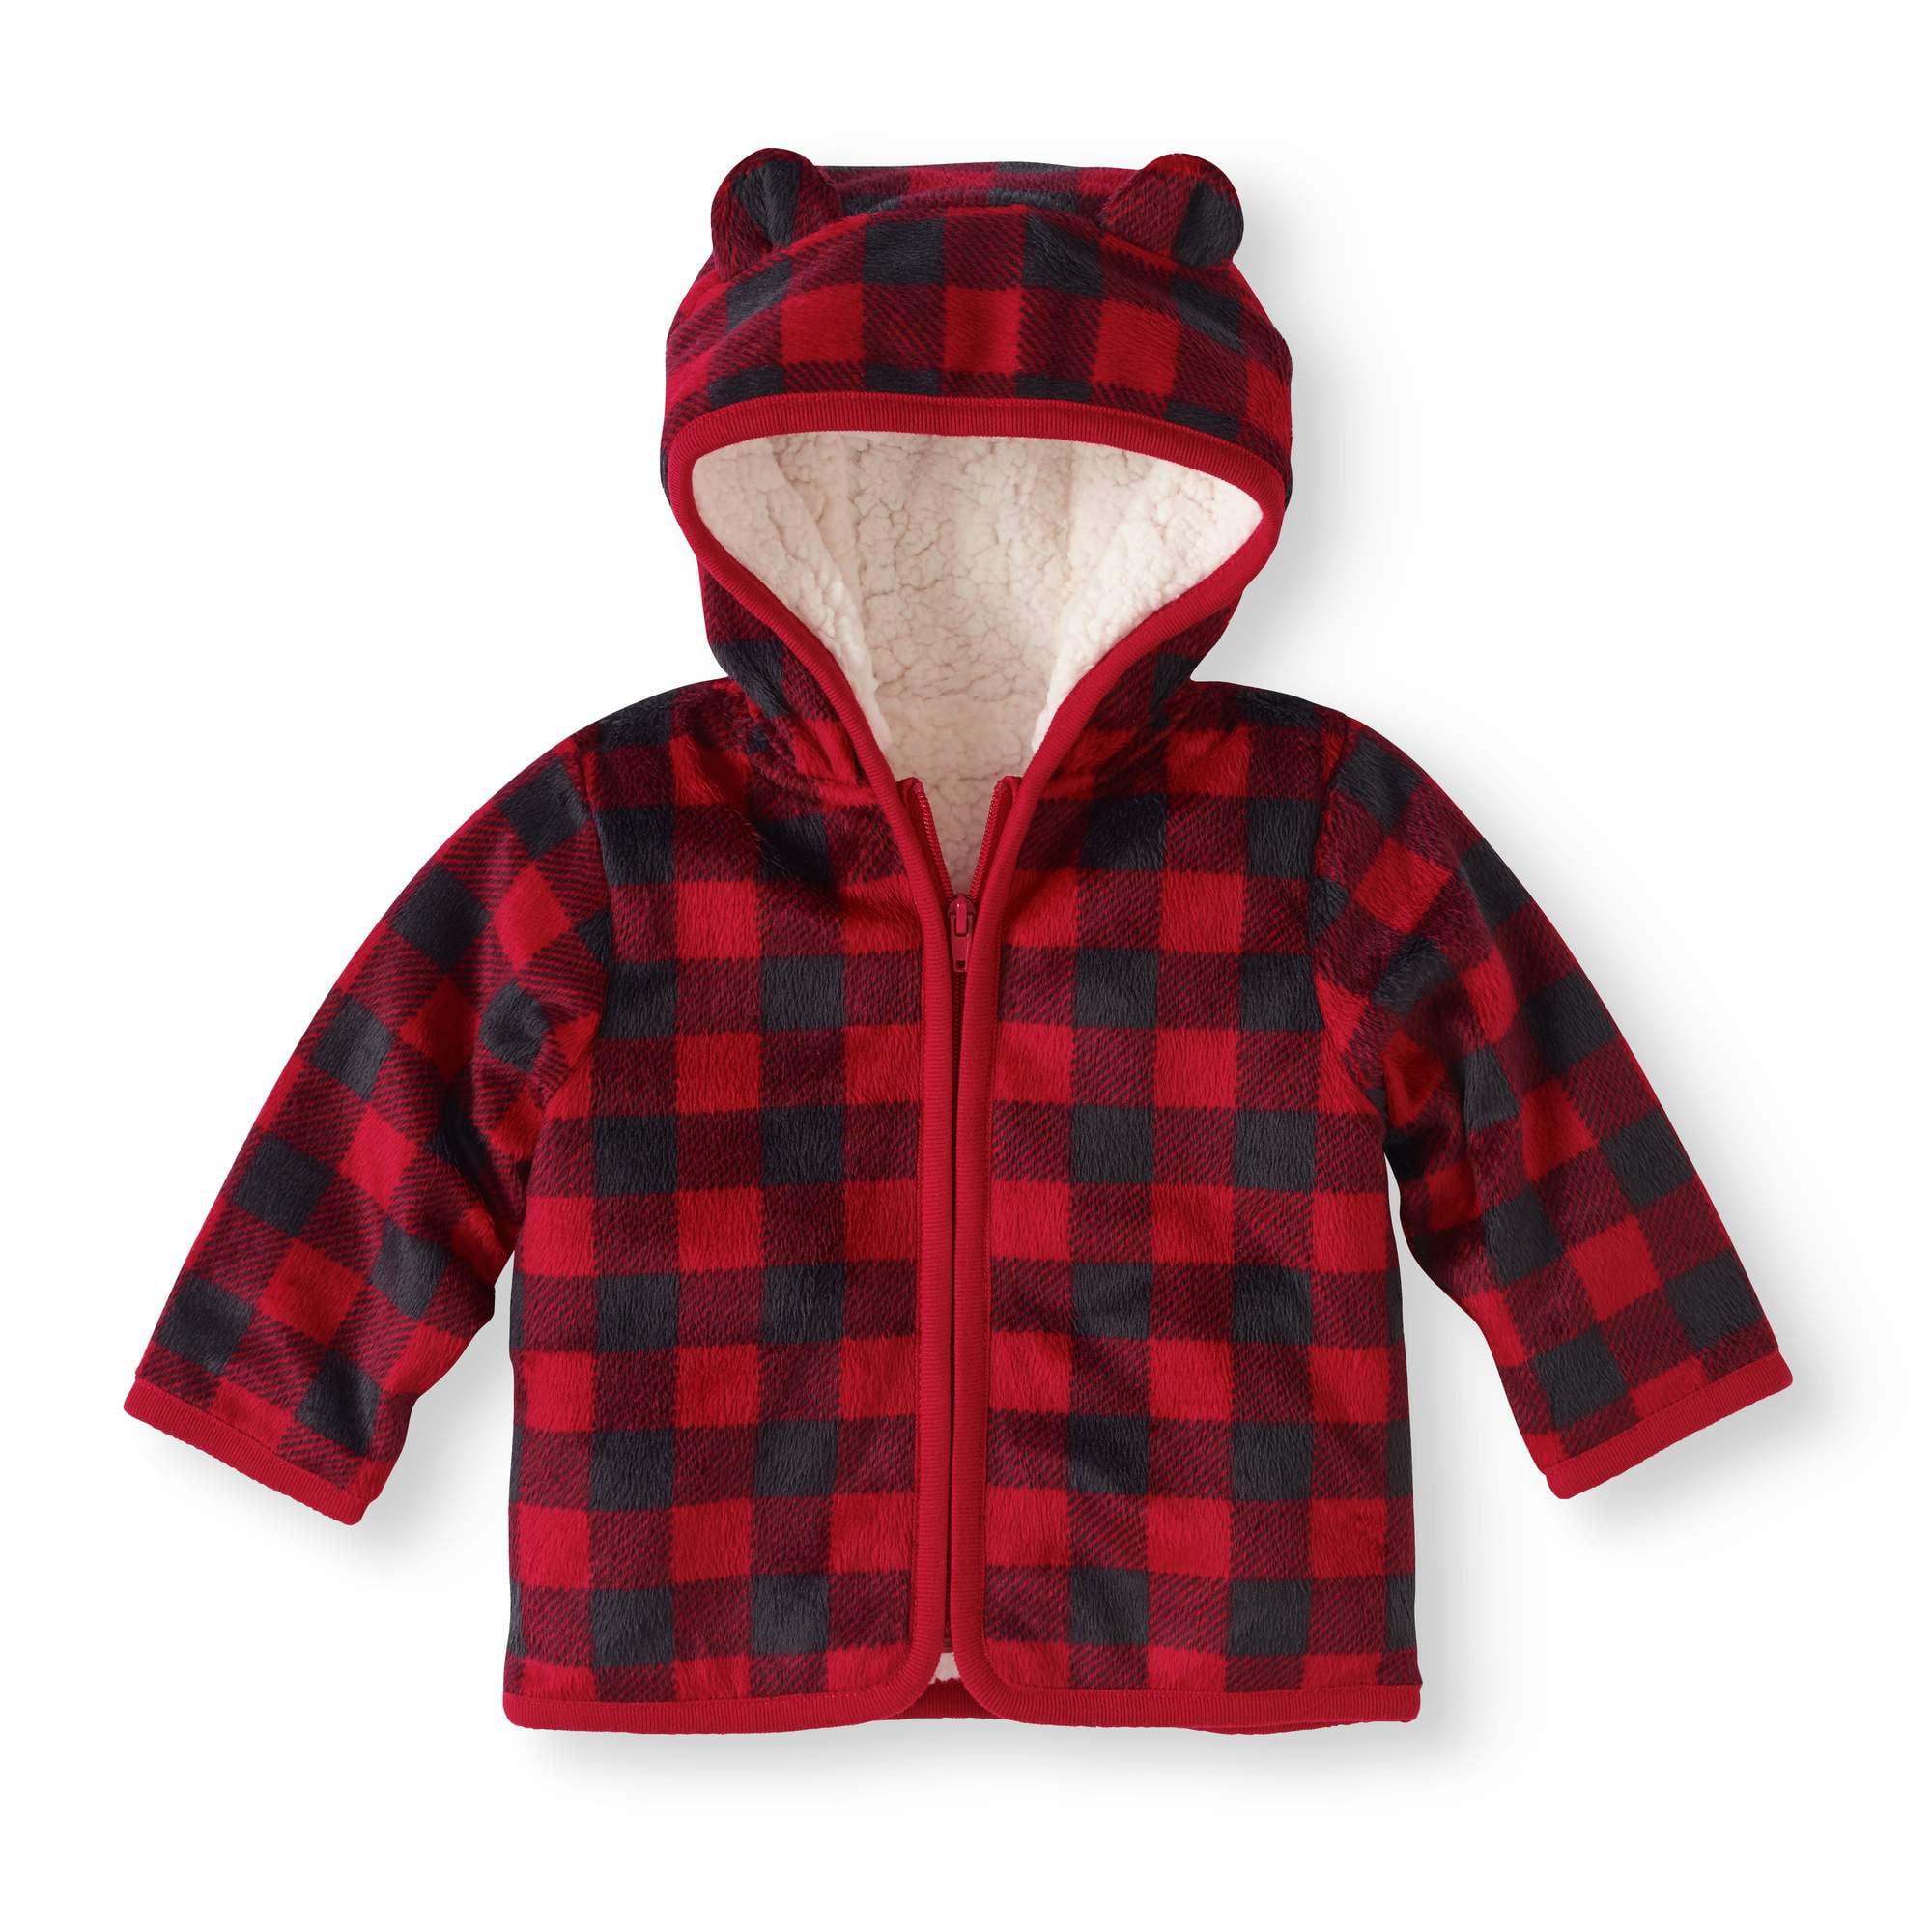 c234d098e Newborn Baby Boy Eared Cozy Fleece and Sherpa Hoodie